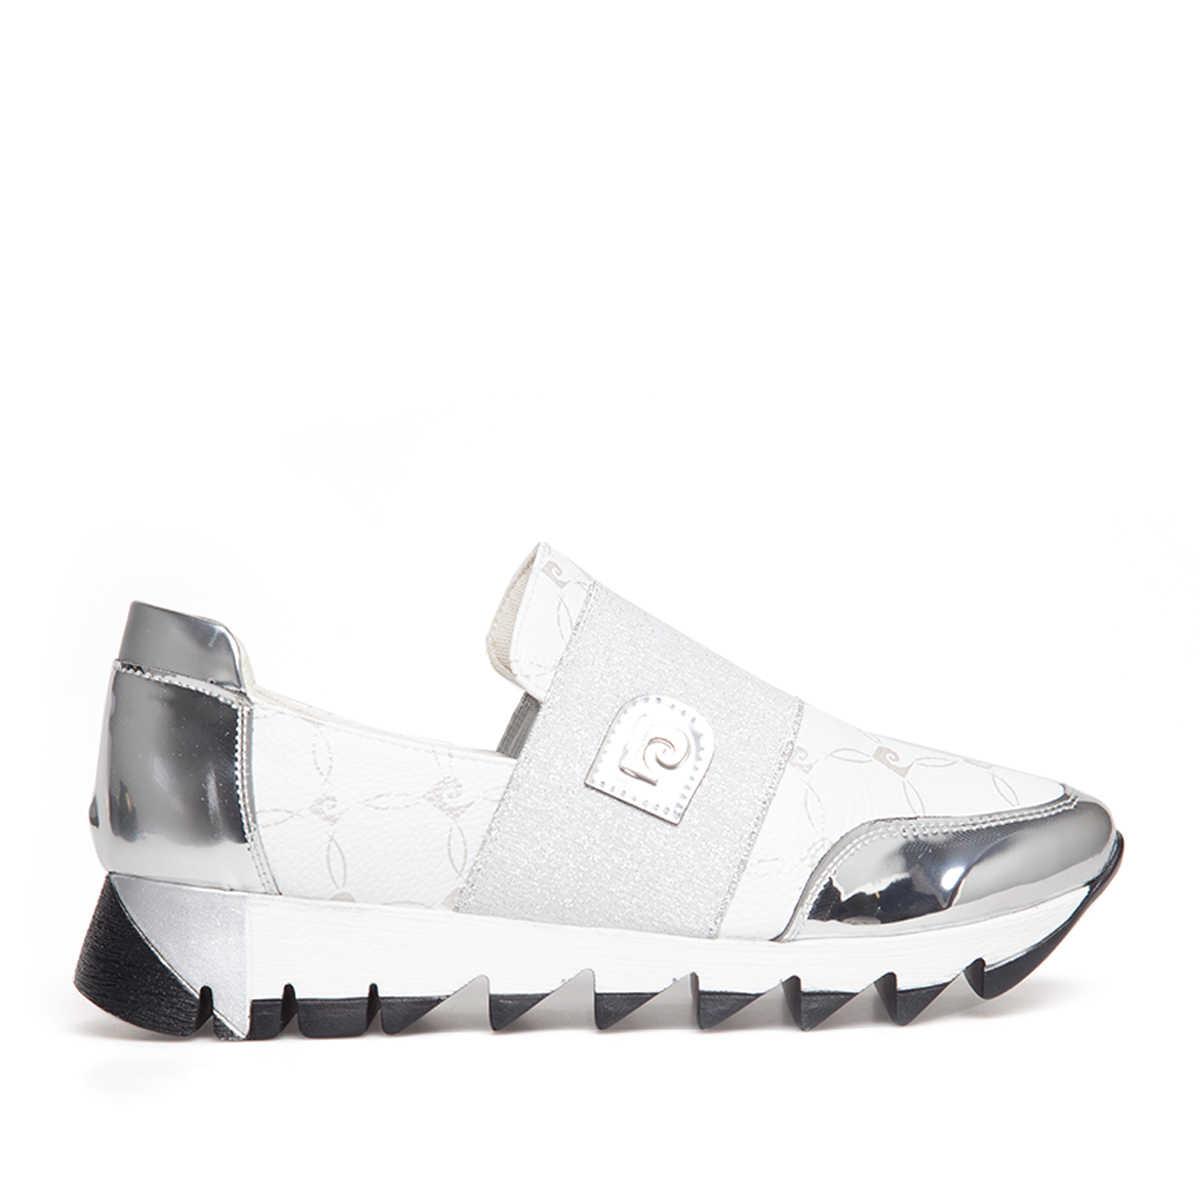 Pierre Cardin Sepatu Wanita Sepatu 90121 Perempuan Sepatu Vulkanisir Aliexpress